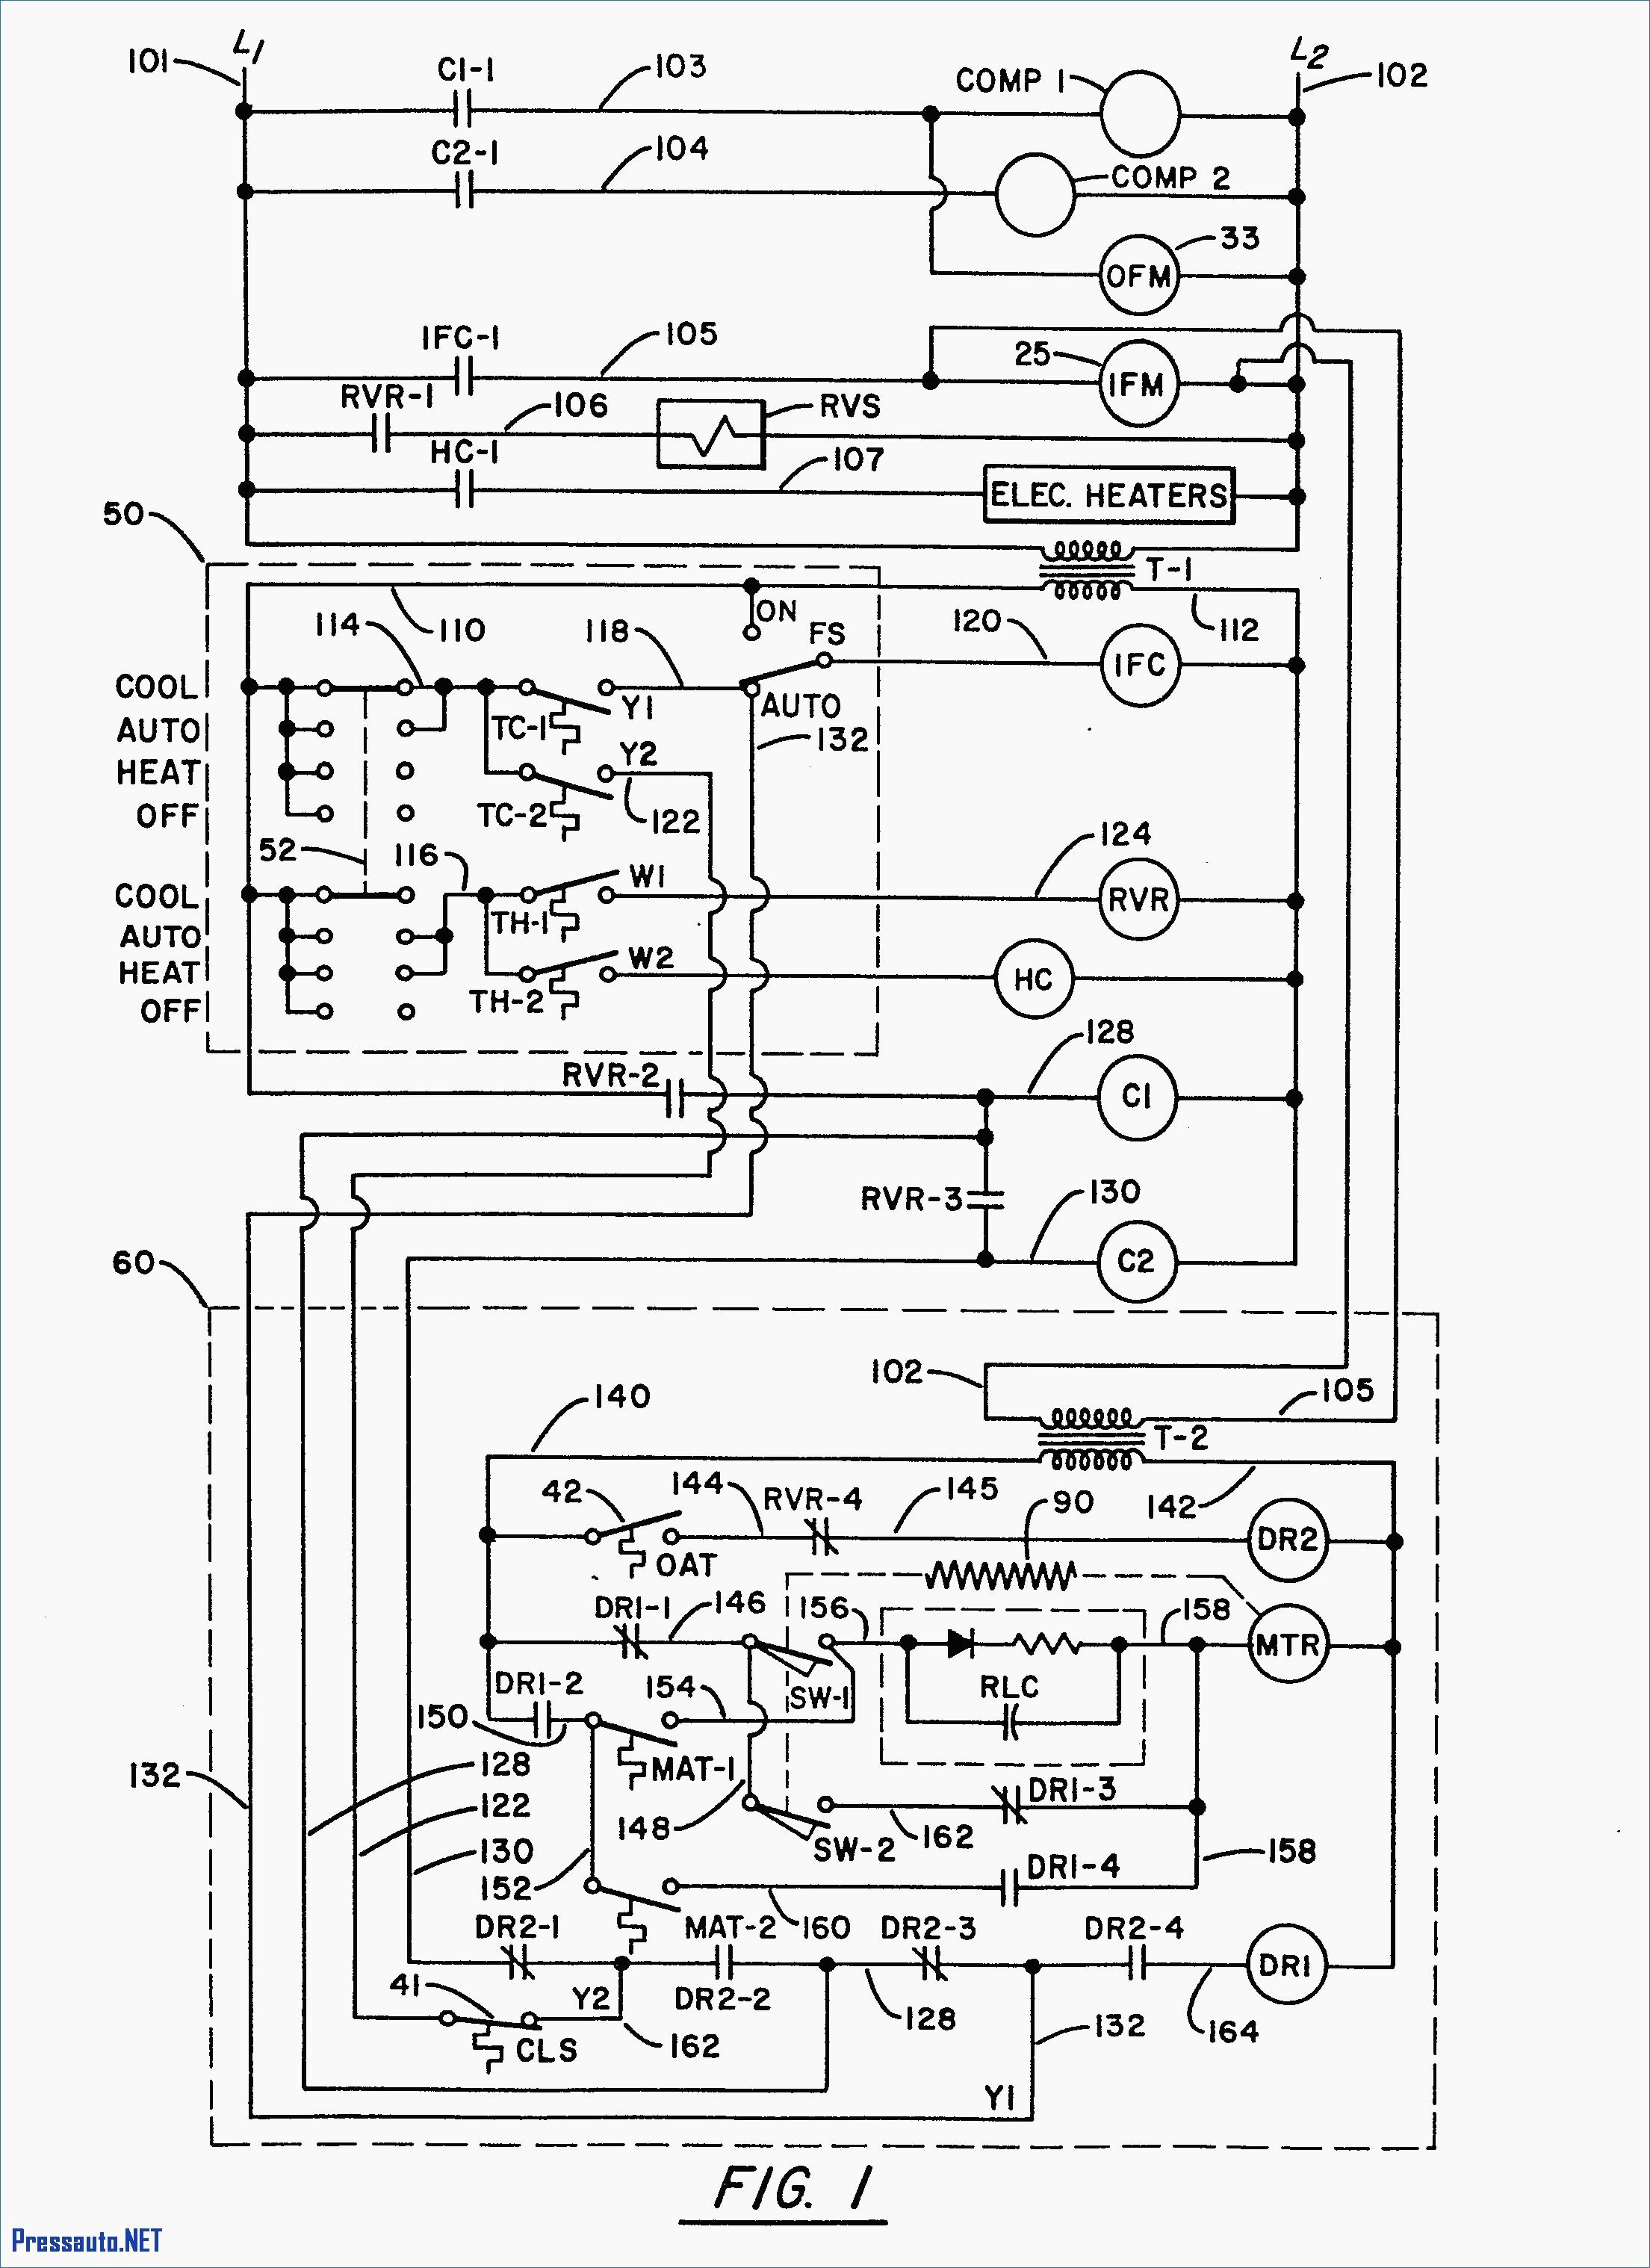 Wiring Diagram for Trane Air Conditioner Fresh York Rooftop Unit Wiring Diagram Wiring Of Wiring Diagram for Trane Air Conditioner